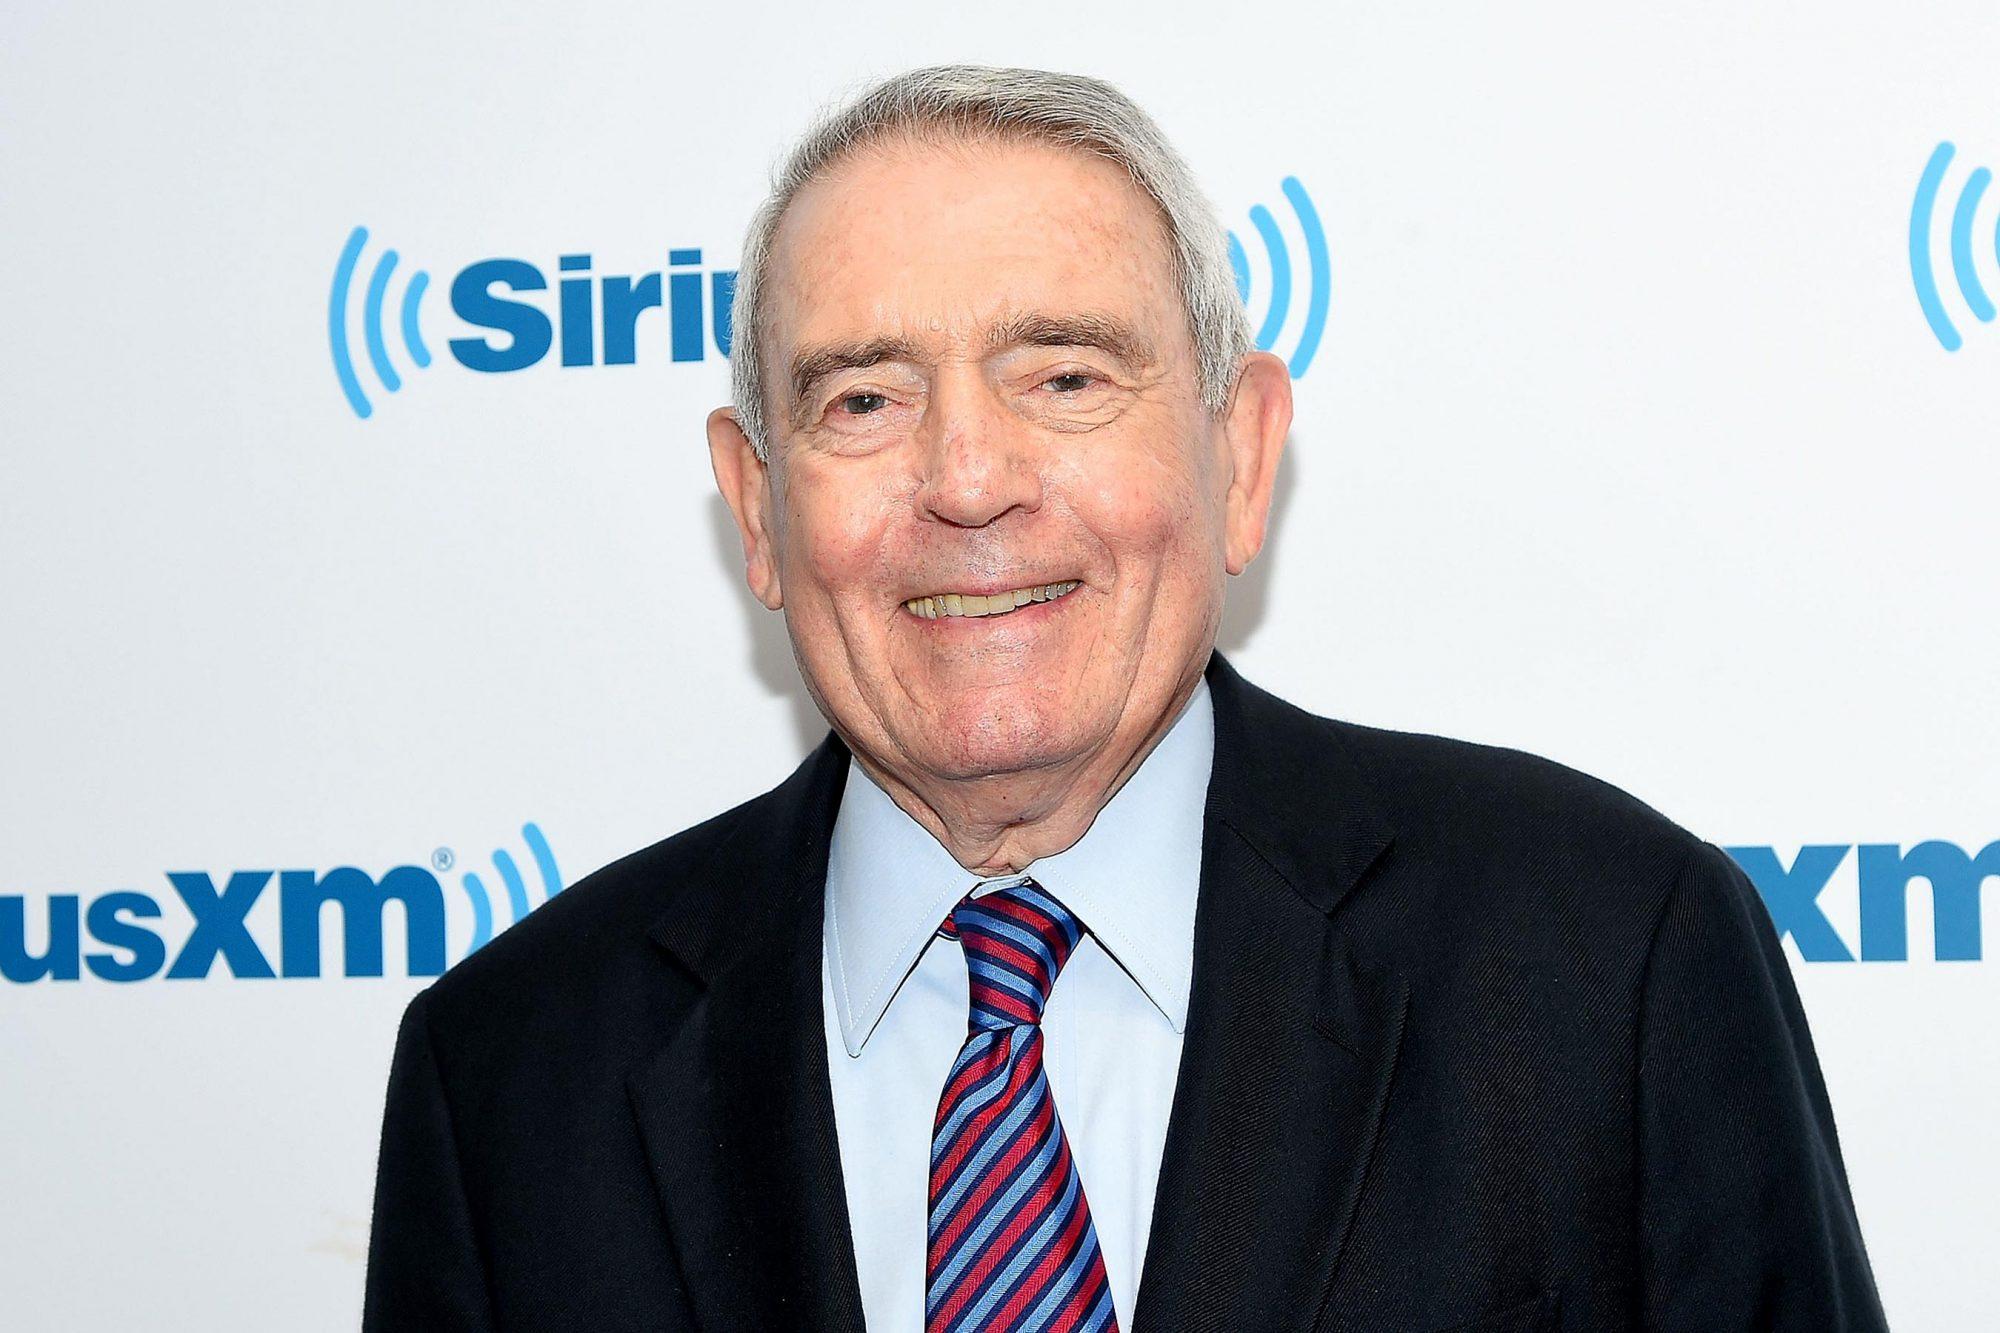 Celebrities Visit SiriusXM - July 12, 2016